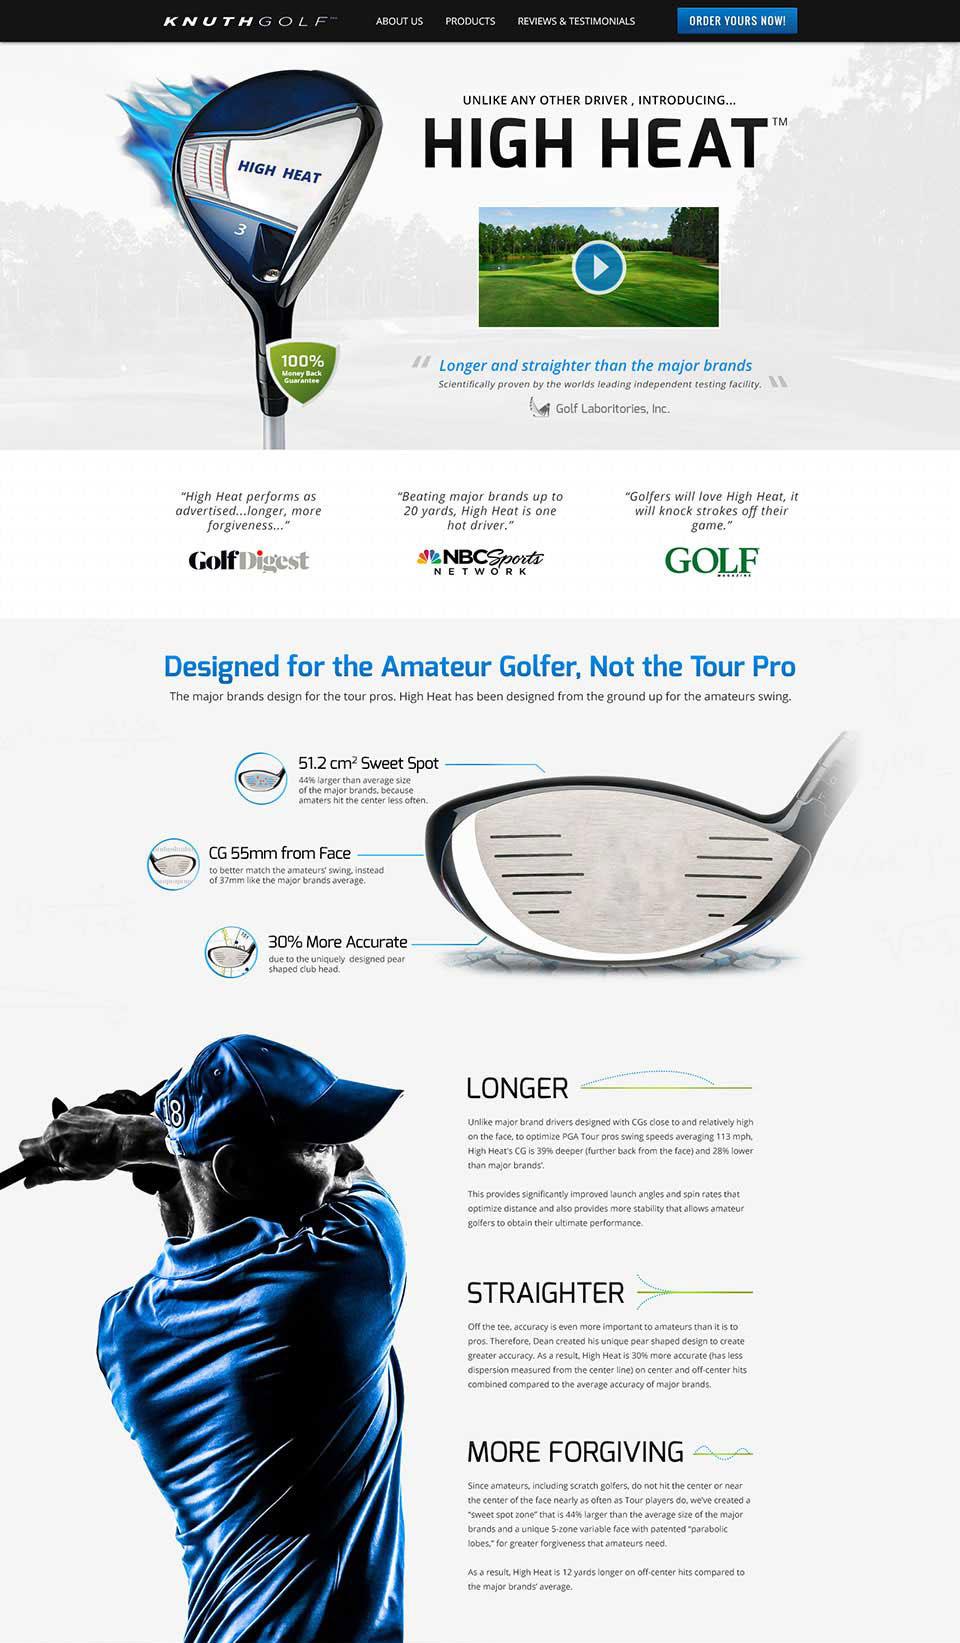 Knuth Golf